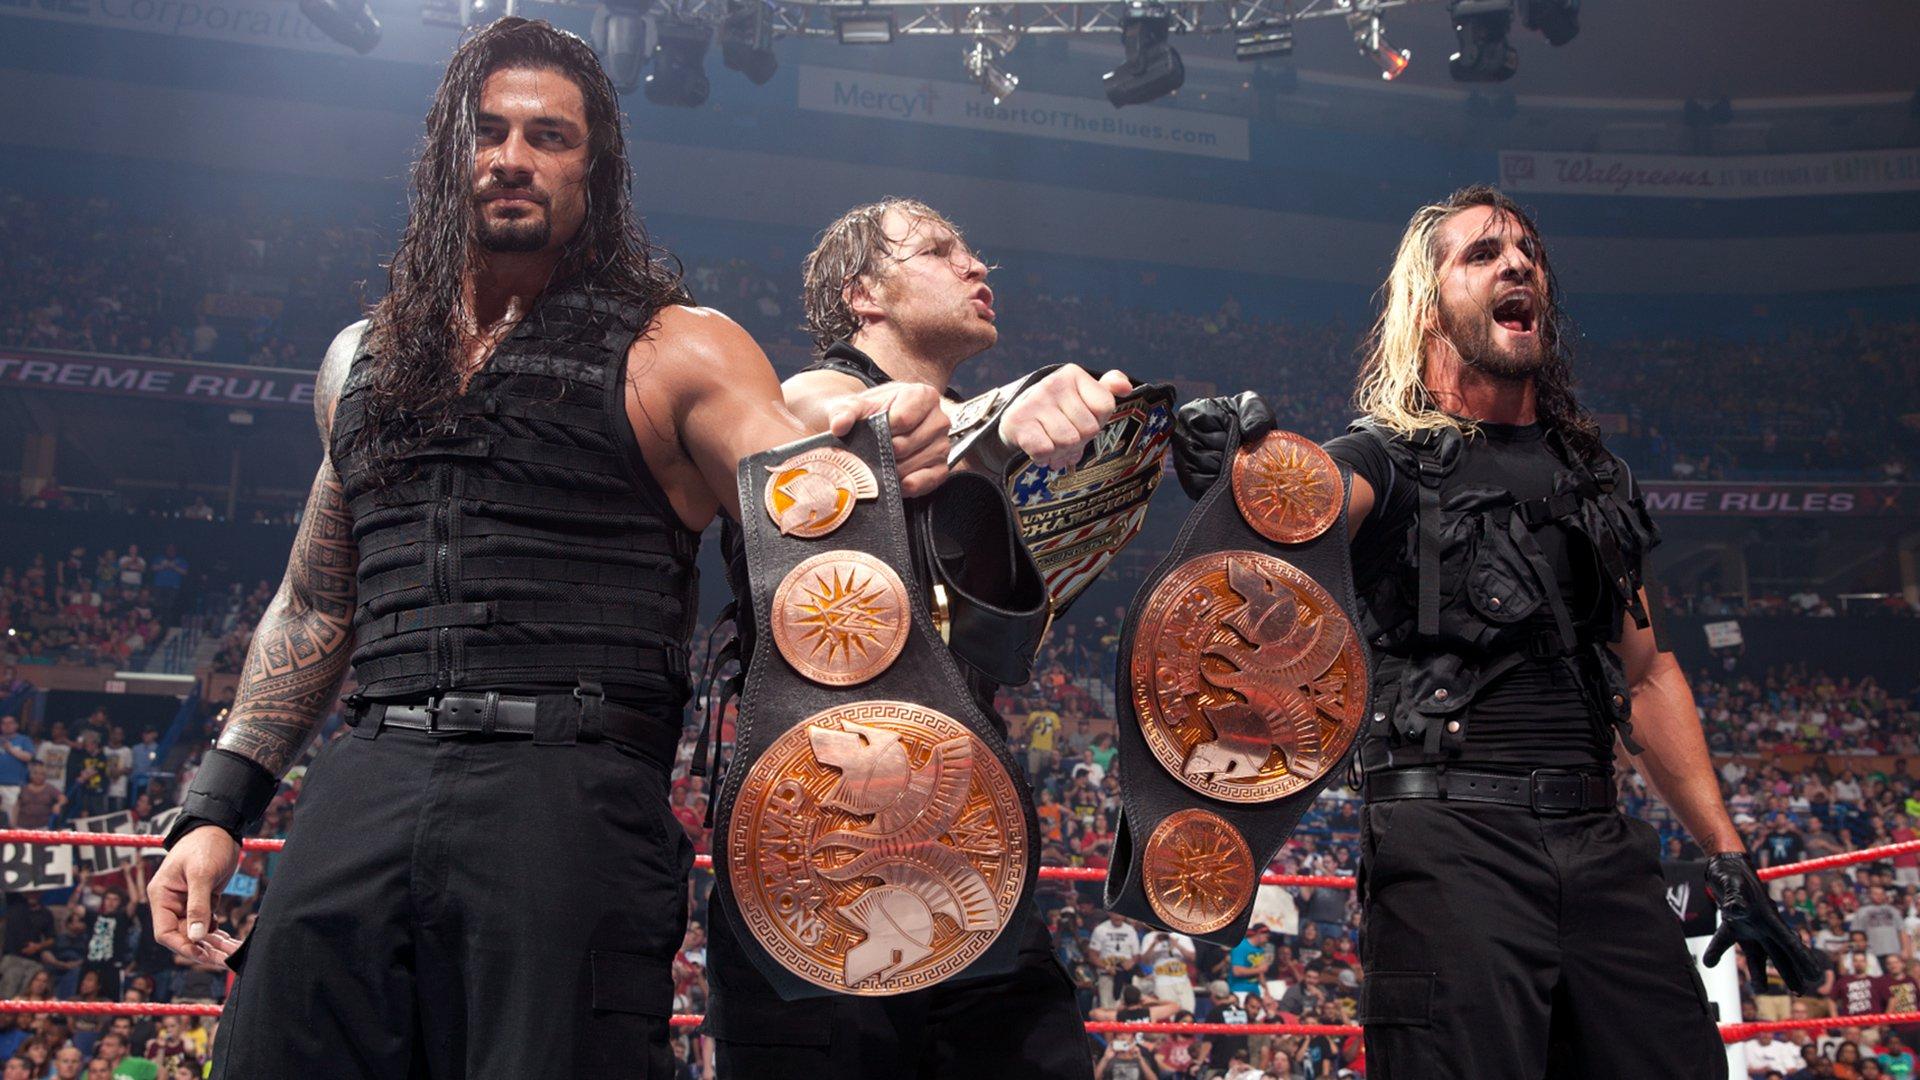 Resultado de imagen para the shield extreme rules 2013